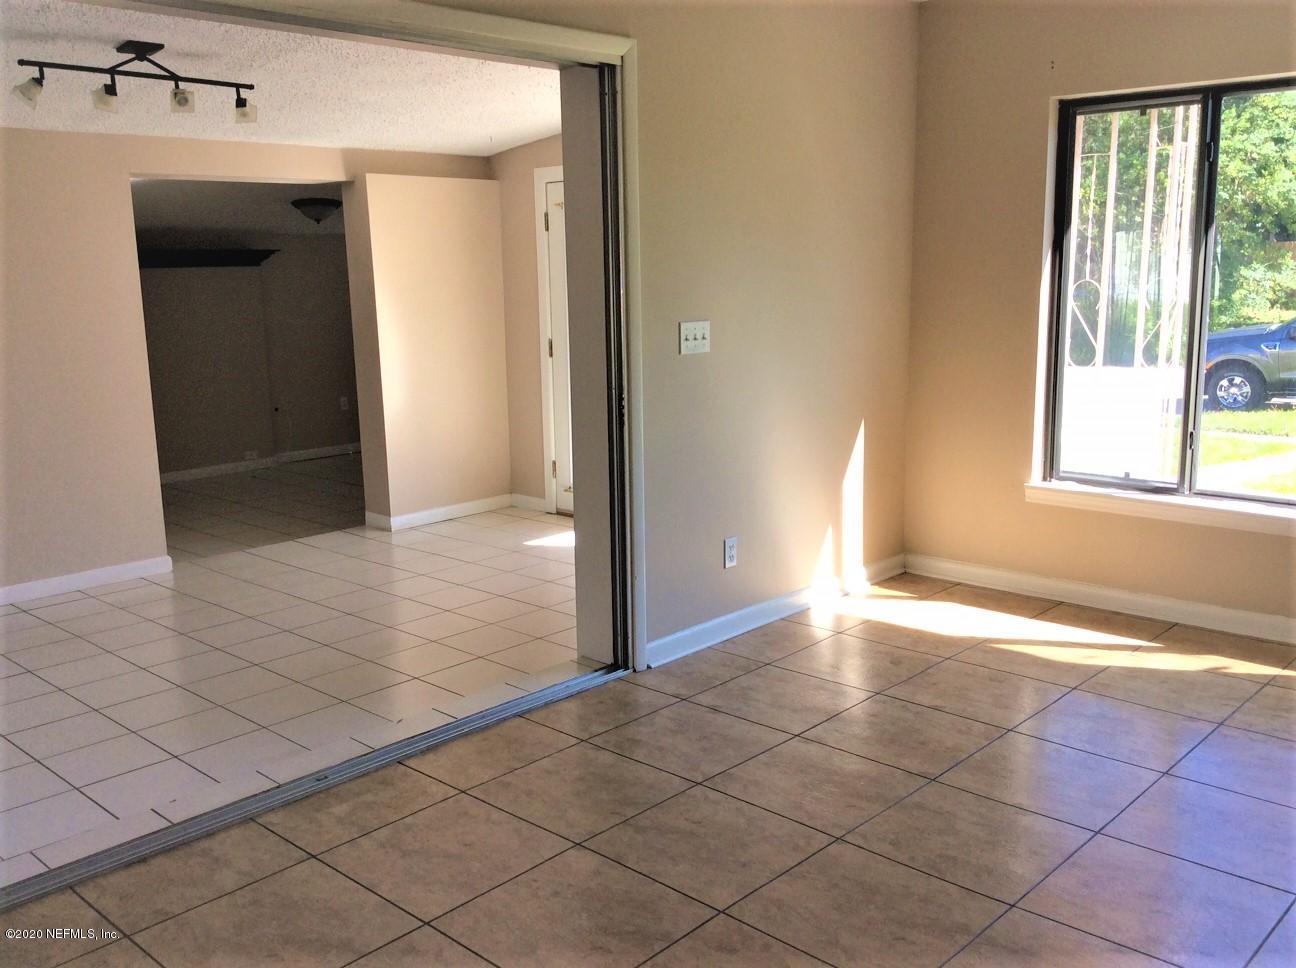 3214 RED OAK, JACKSONVILLE, FLORIDA 32277, 3 Bedrooms Bedrooms, ,1 BathroomBathrooms,Residential,For sale,RED OAK,1083404